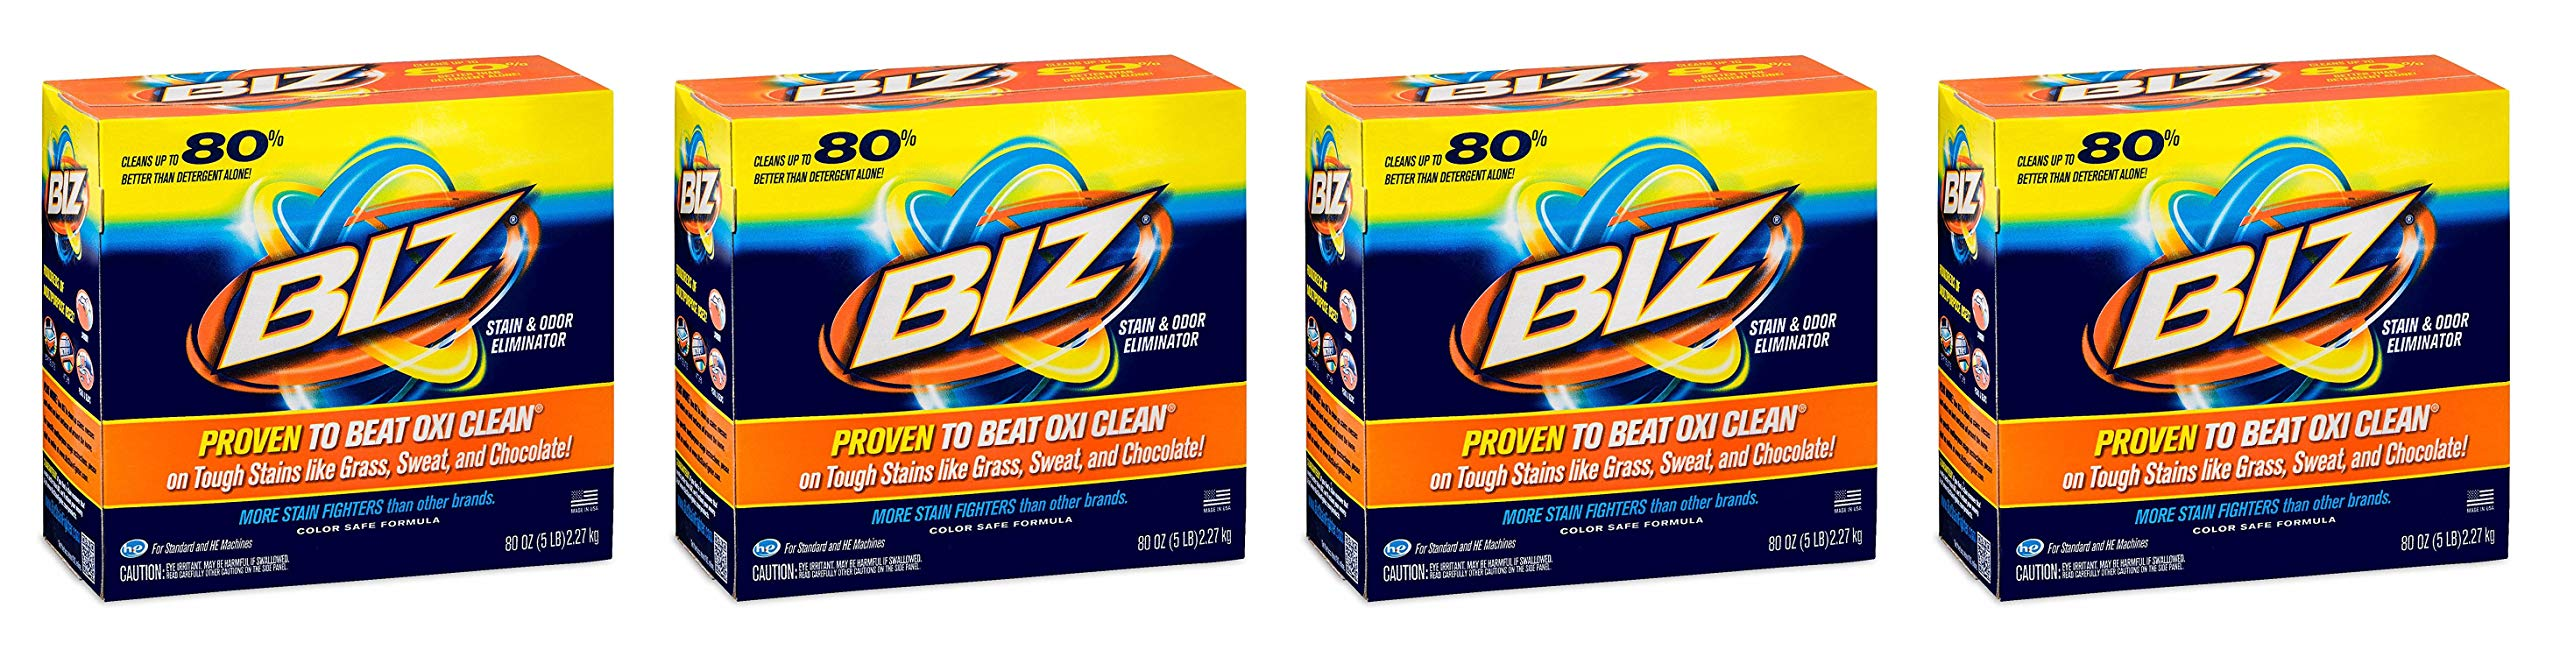 BIZ Stain & Odor Eliminator Laundry Detergent Powder (80 oz.) (4-(Pack))